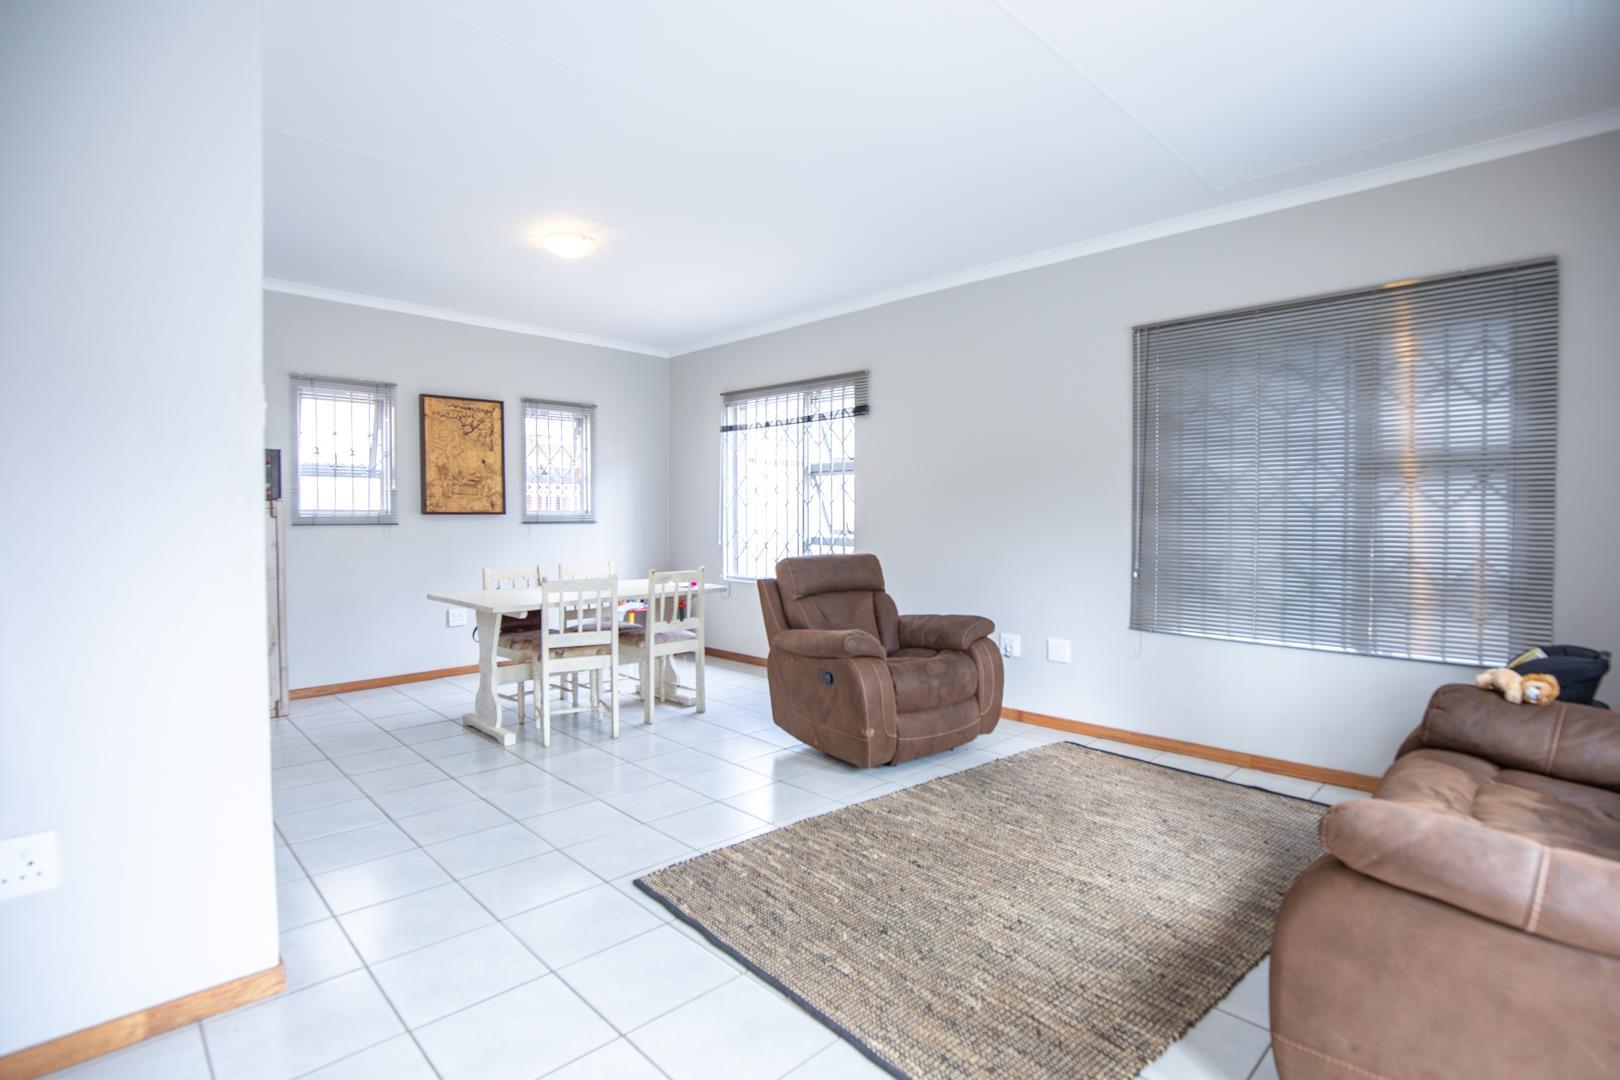 3 Bedroom House For Sale in Waterkloof Ridge